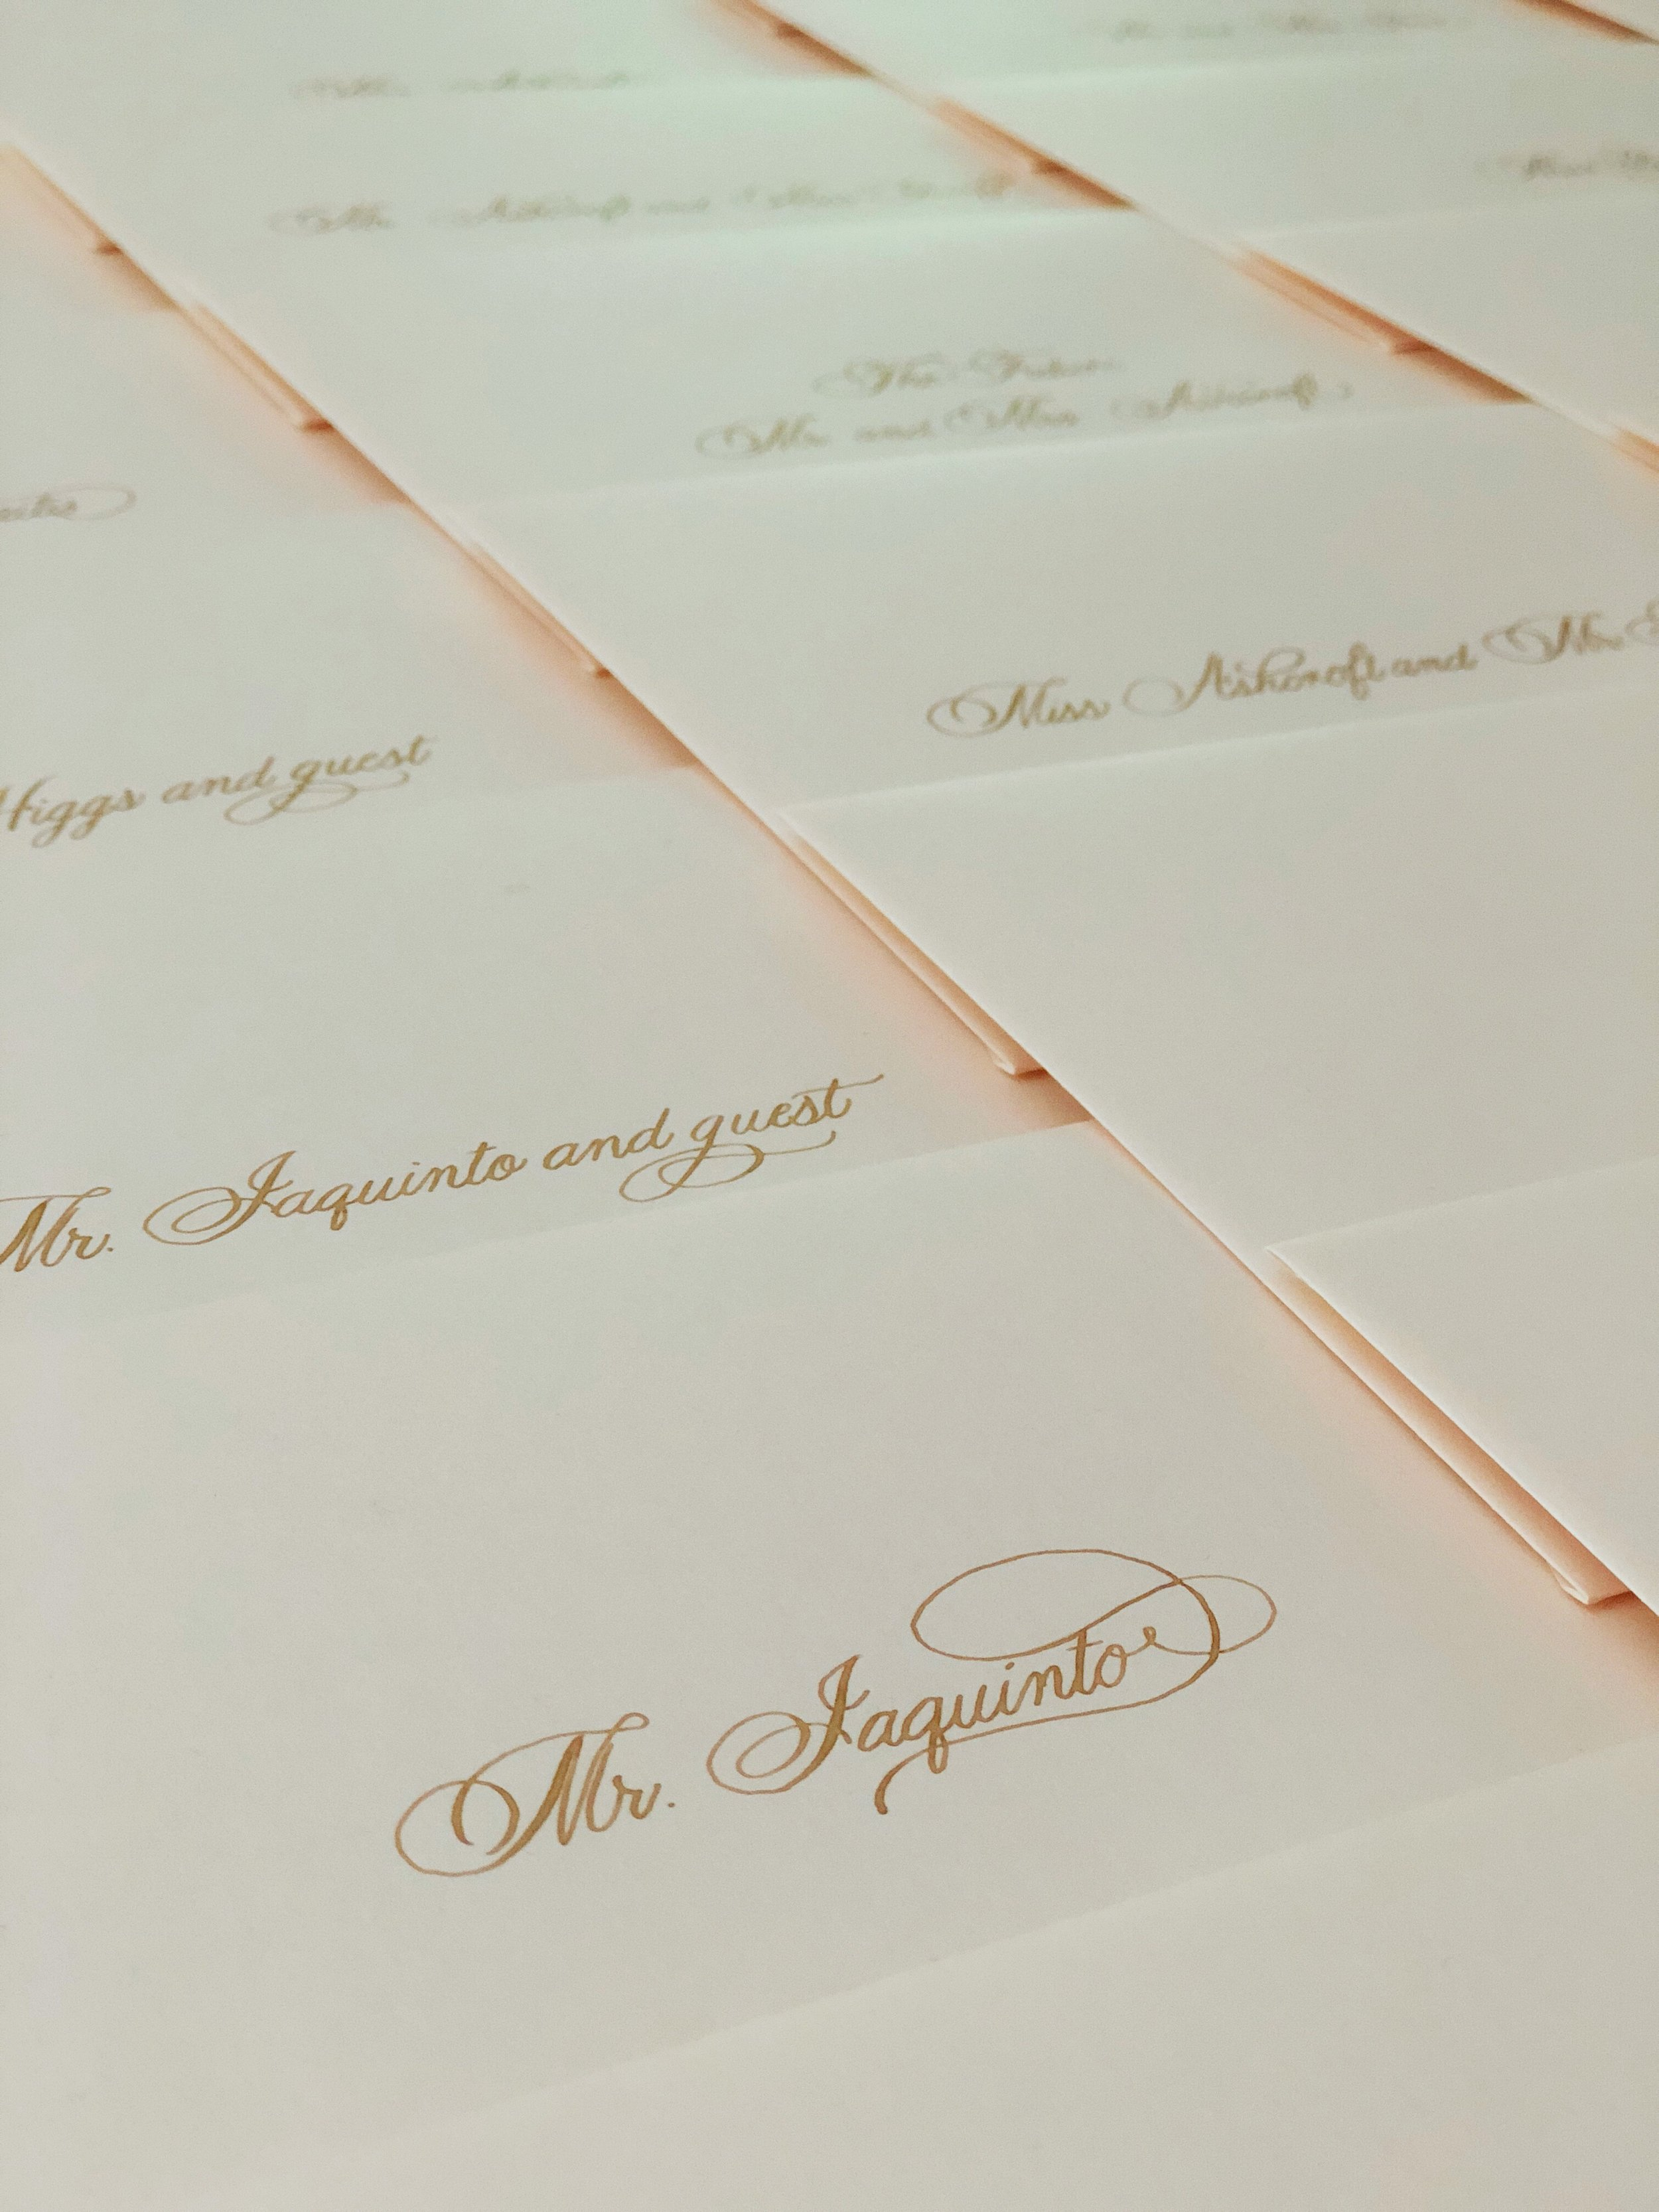 Central PA, York PA, JesSmith Designs, custom, wedding, invitations, bridal, Harrisburg, hanover, calligraphy, baltimore, wedding invitations, lancaster, gettysburg, 06-19 16.59.09.jpg